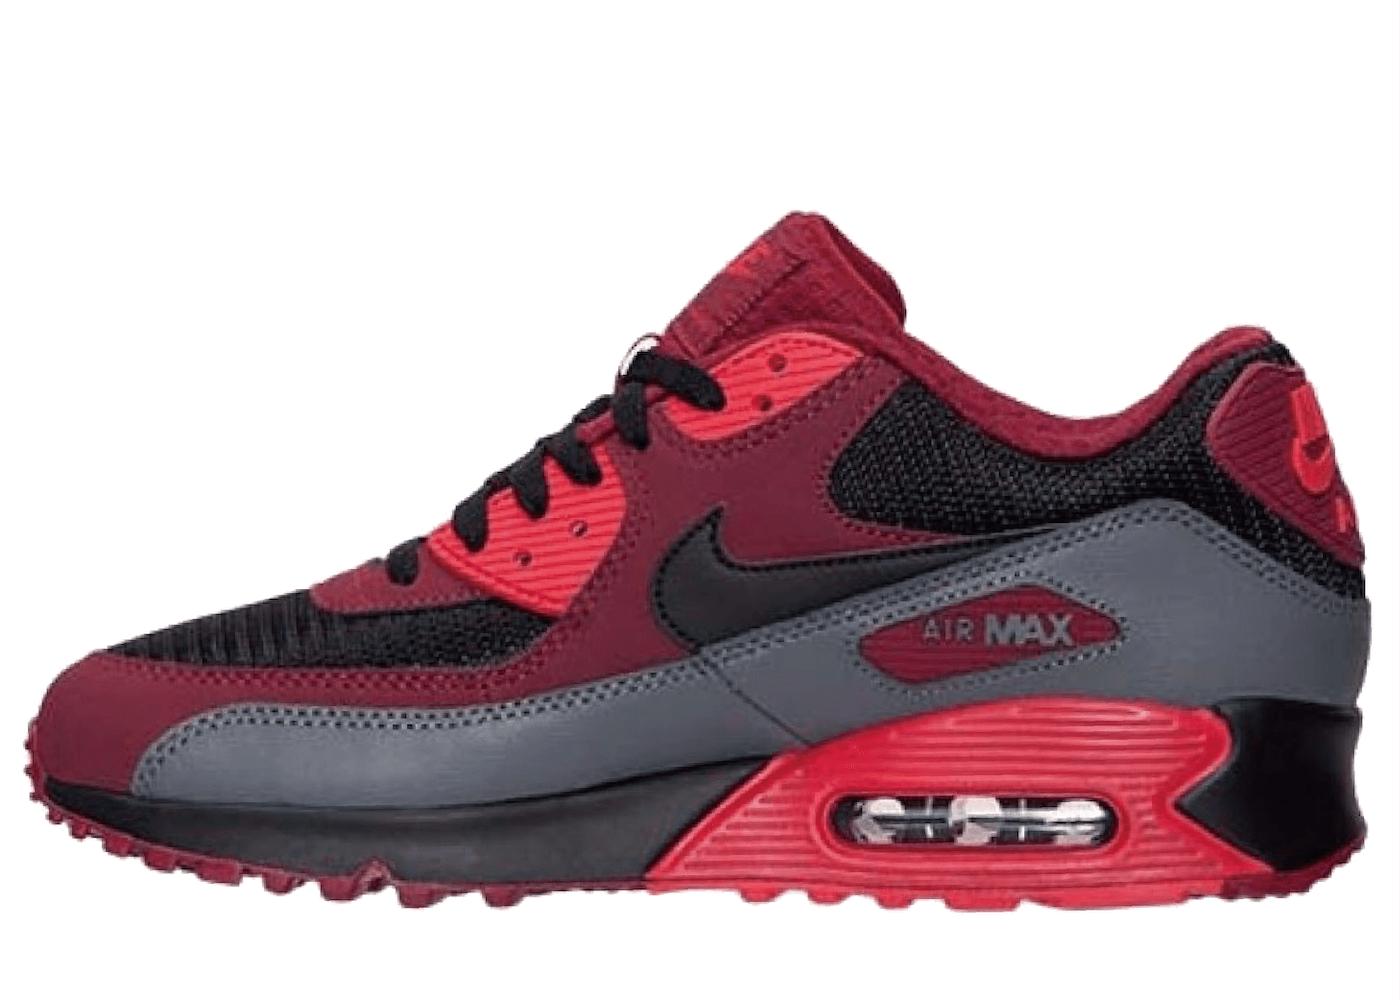 Nike Air Max 90 Team Red Black Dark Greyの写真